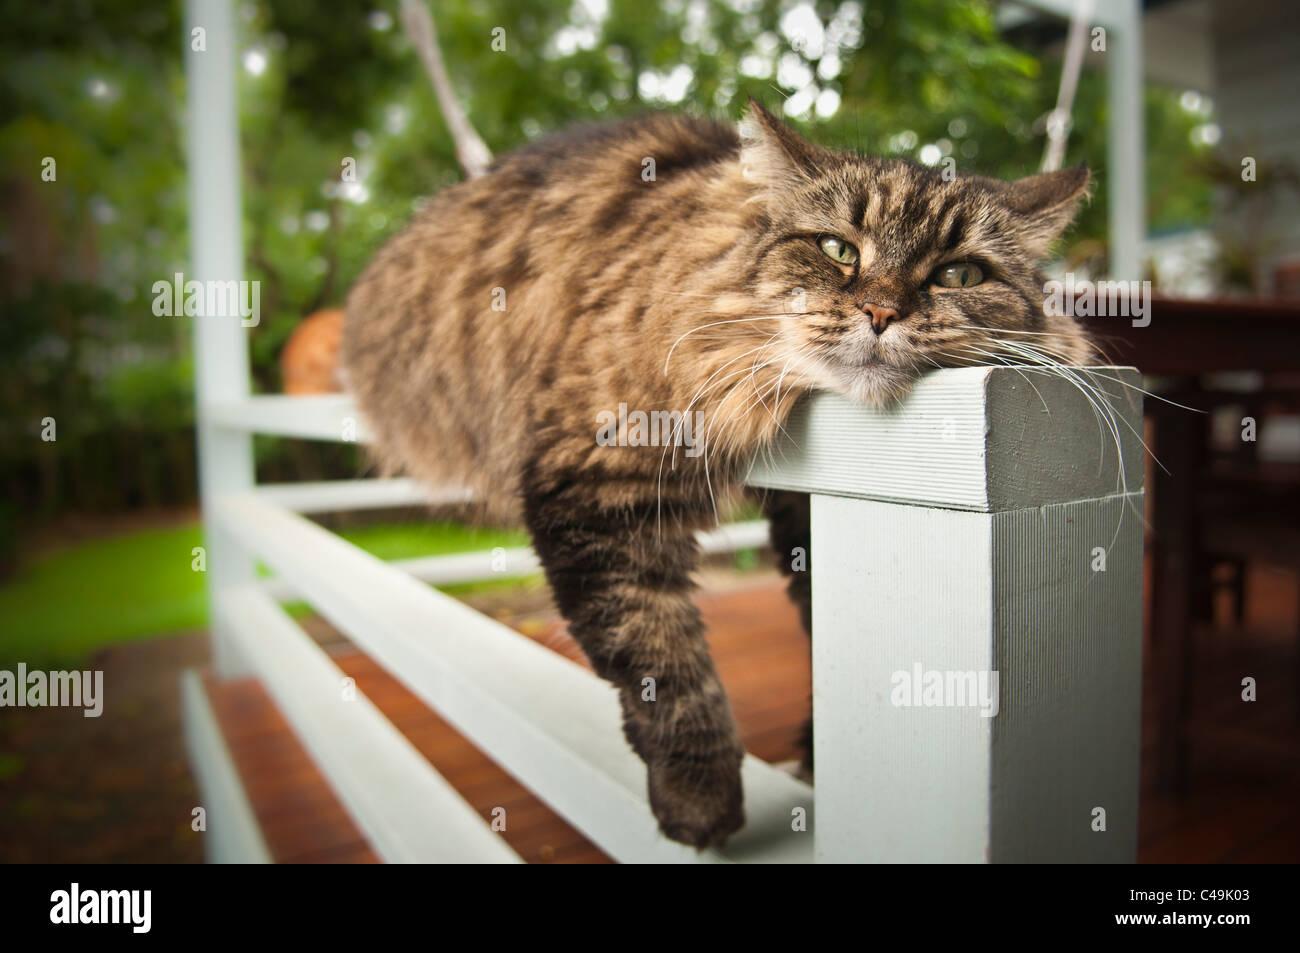 Cat sprawled over railing Stock Photo